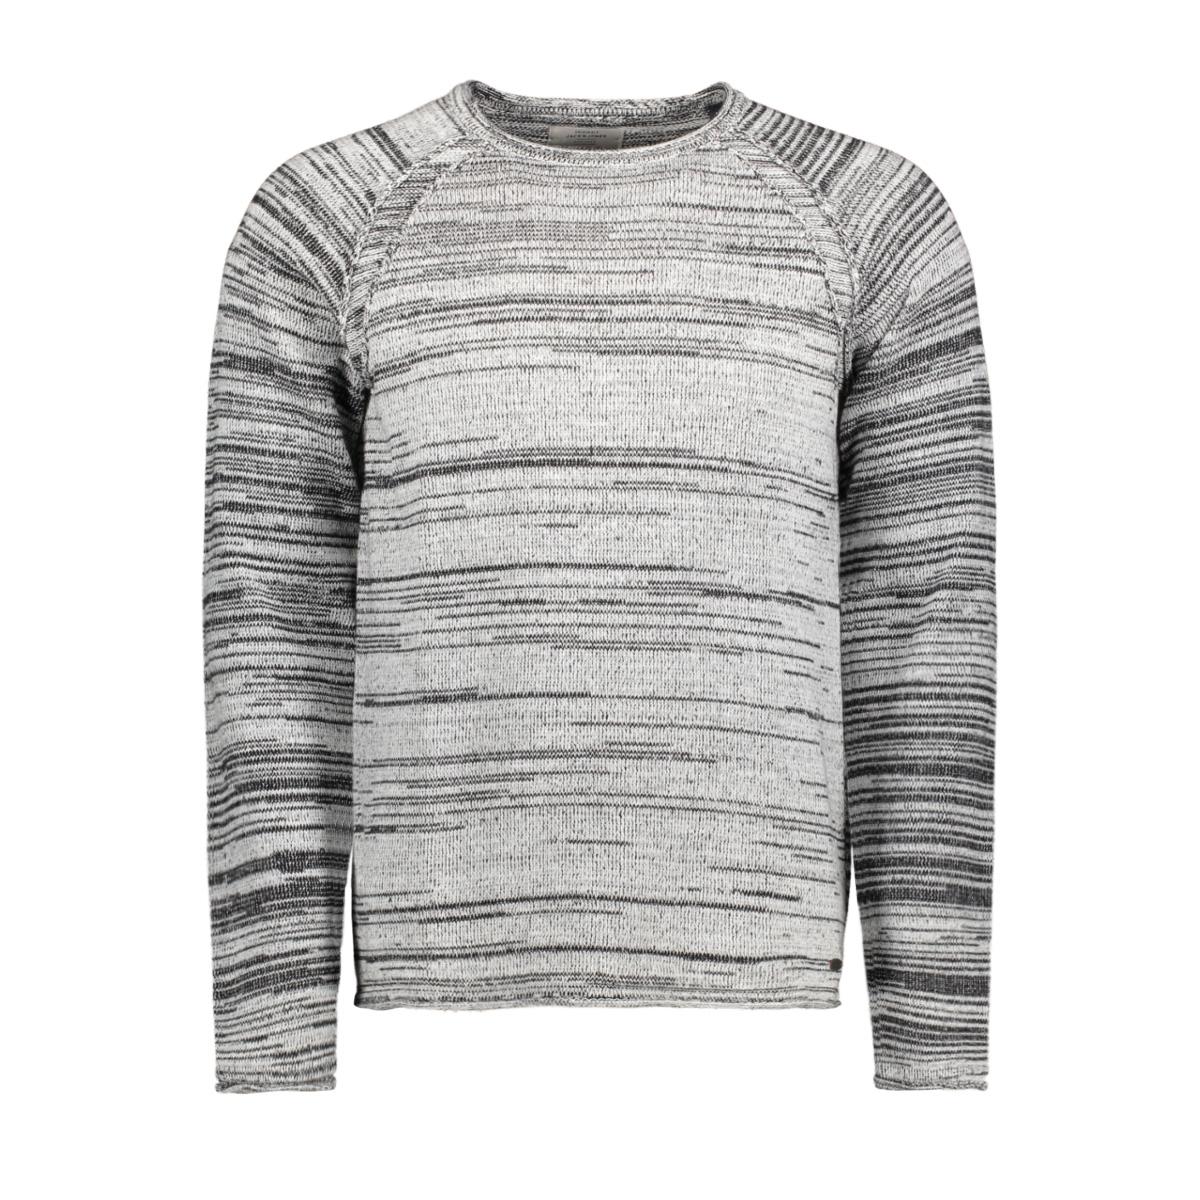 jordavido knit raglan 12145503 jack & jones trui jet stream/knit